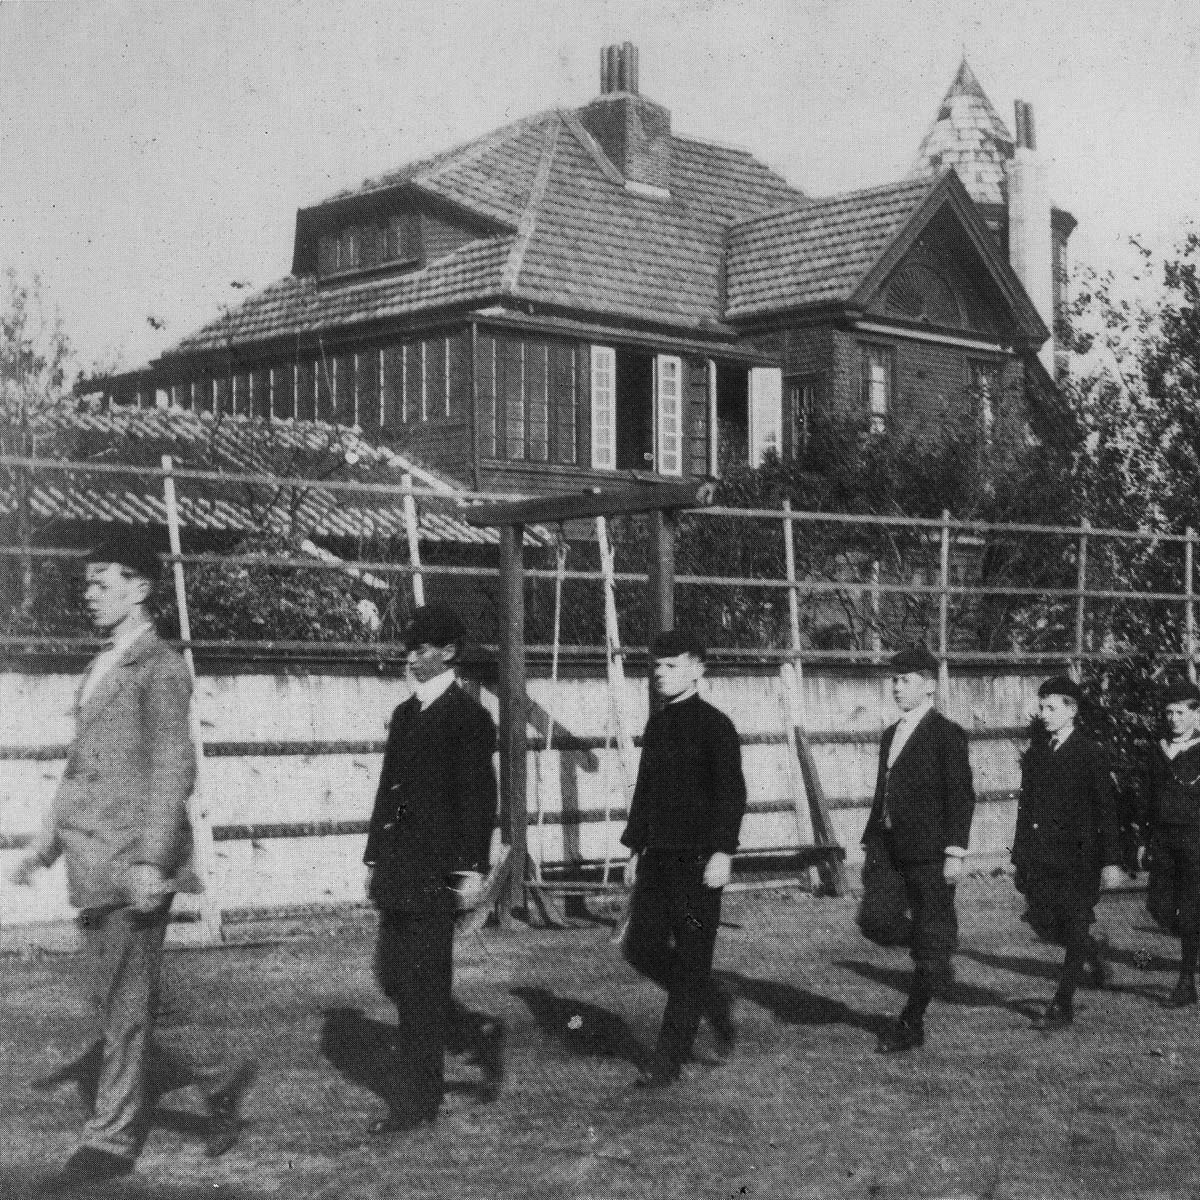 ASIJ Tsukiji Campus from 1910